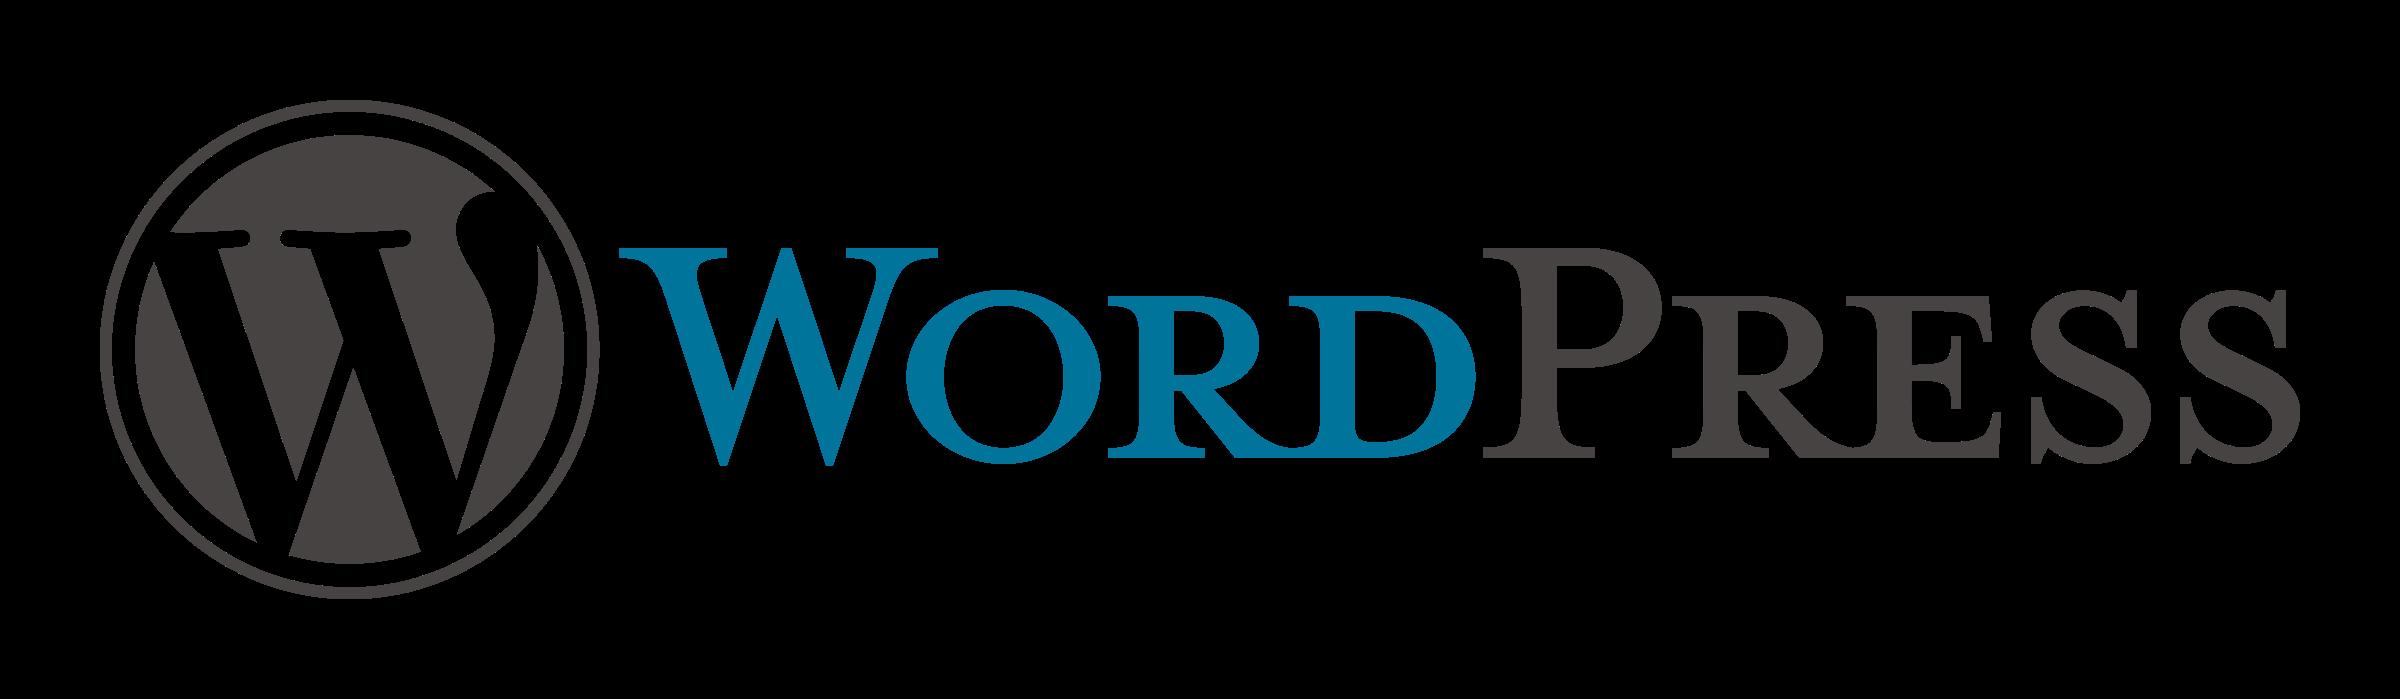 wordpress-logo-png-transparent